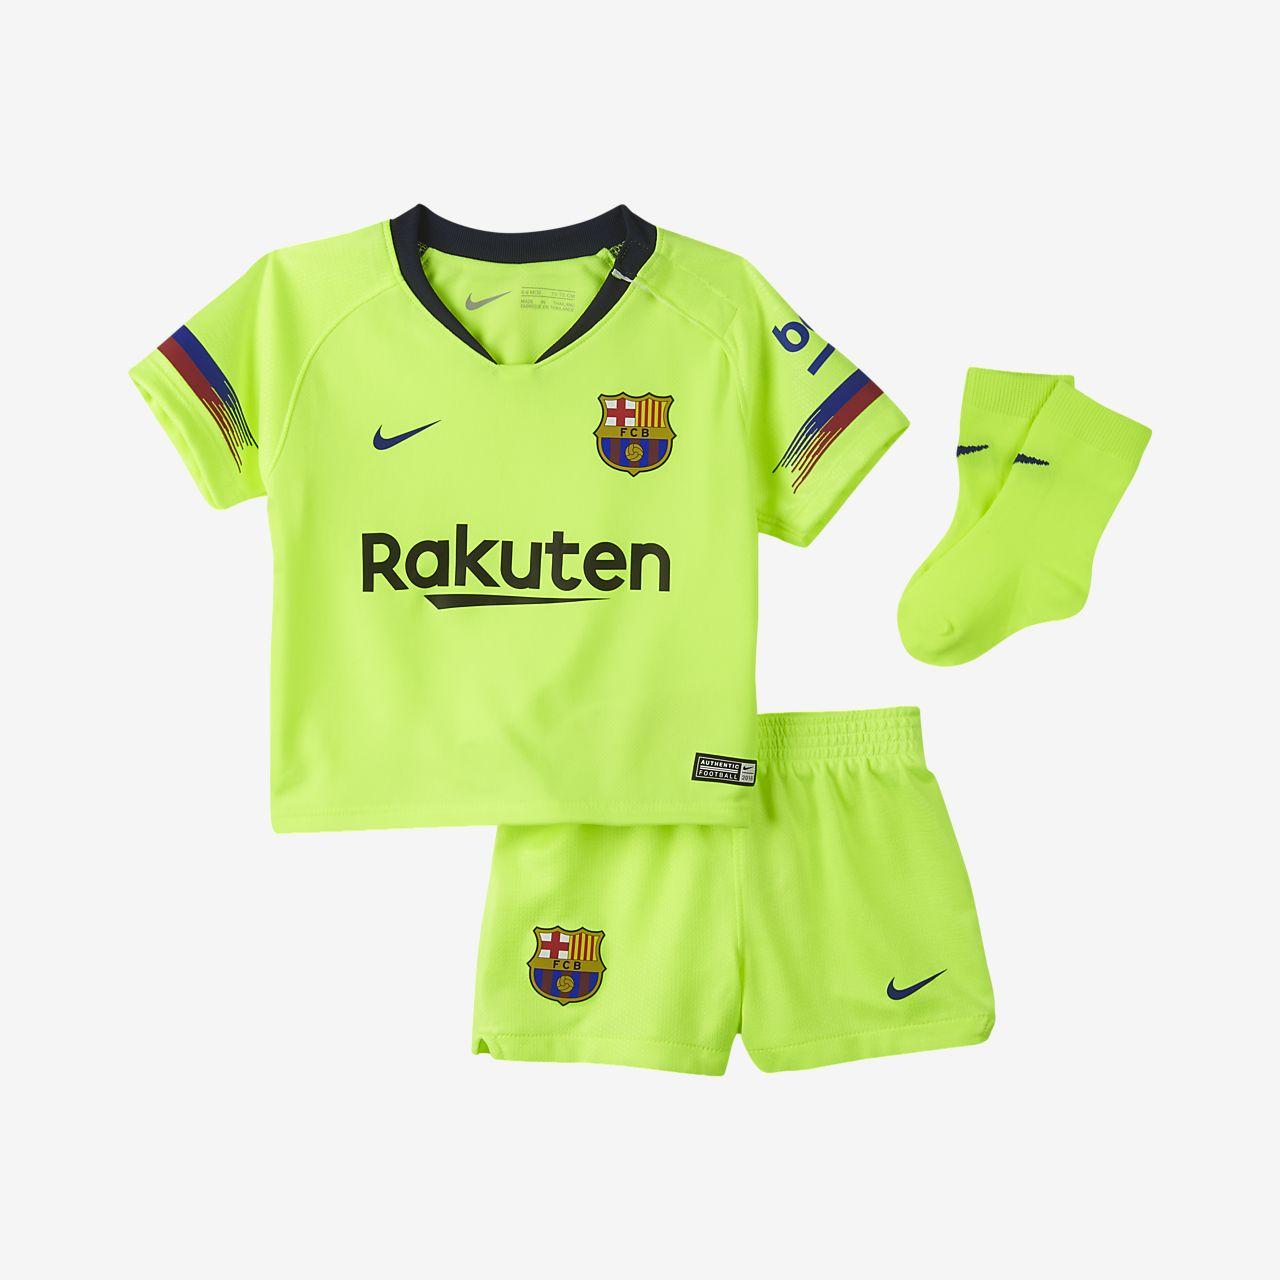 14c87d2aeec16 ... Kit de fútbol para bebé e infantil de visitante Stadium del FC  Barcelona 2018 19